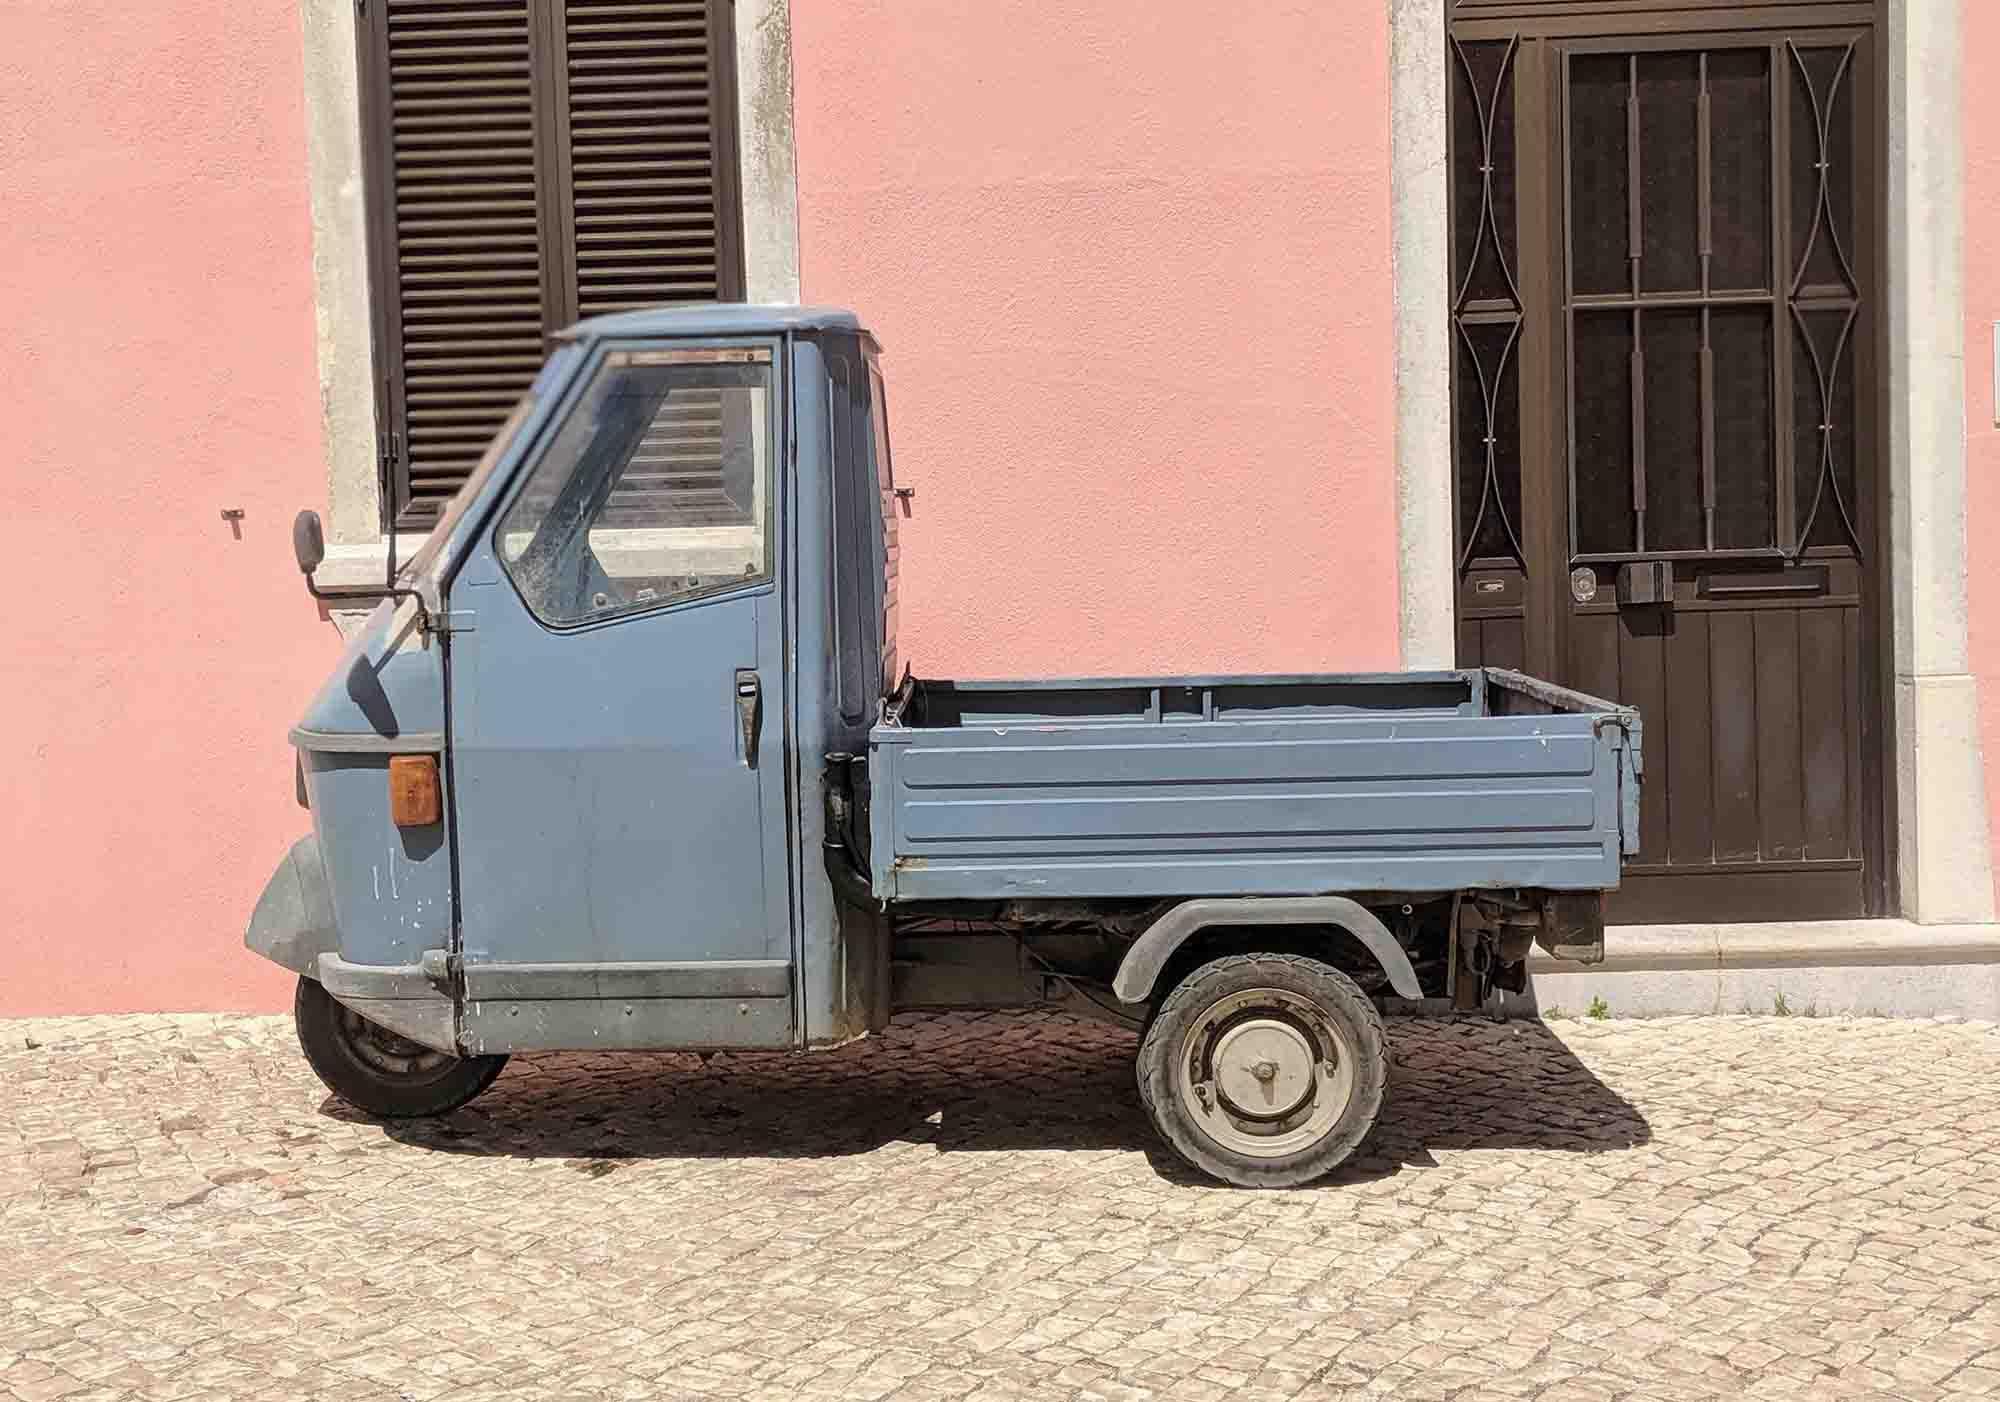 Portuguese 3 wheel vehicle